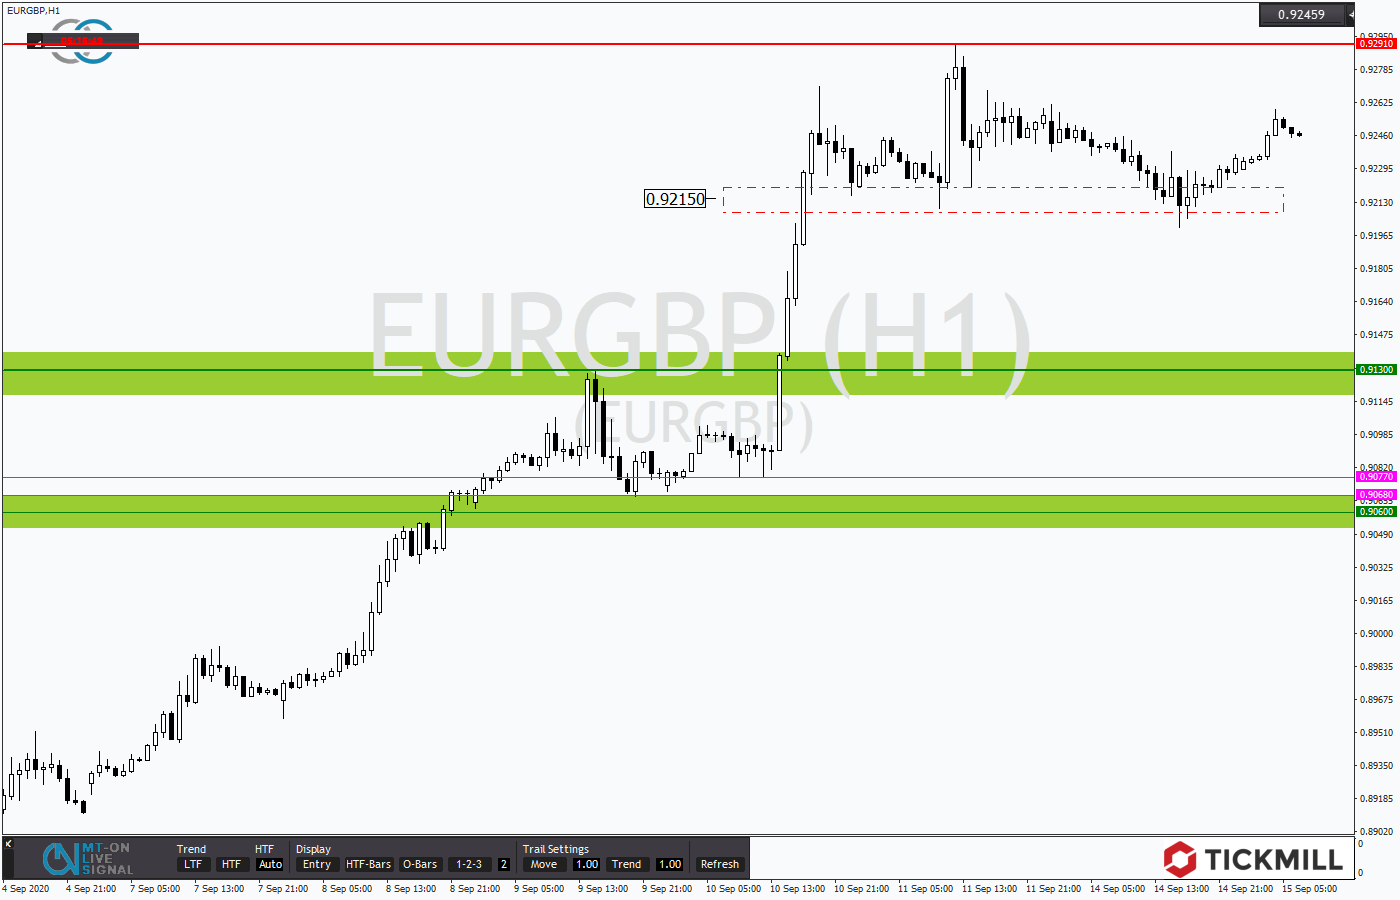 Tickmill-Analyse: EURGBP im Stundenverlauf